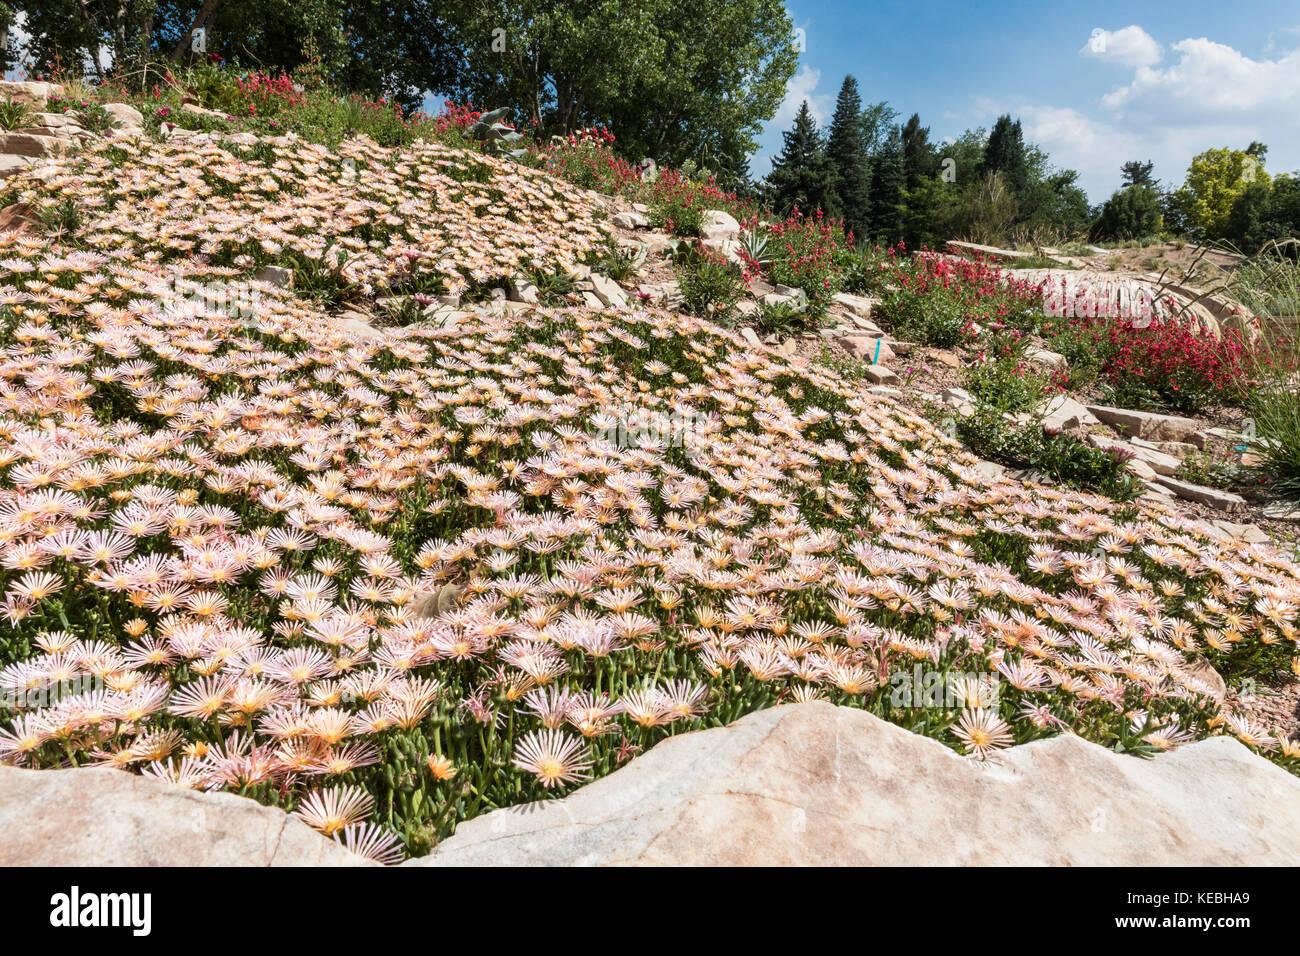 Succulento giardino, denver Botanic Gardens, Denver, Colorado, Stati Uniti d'America Immagini Stock